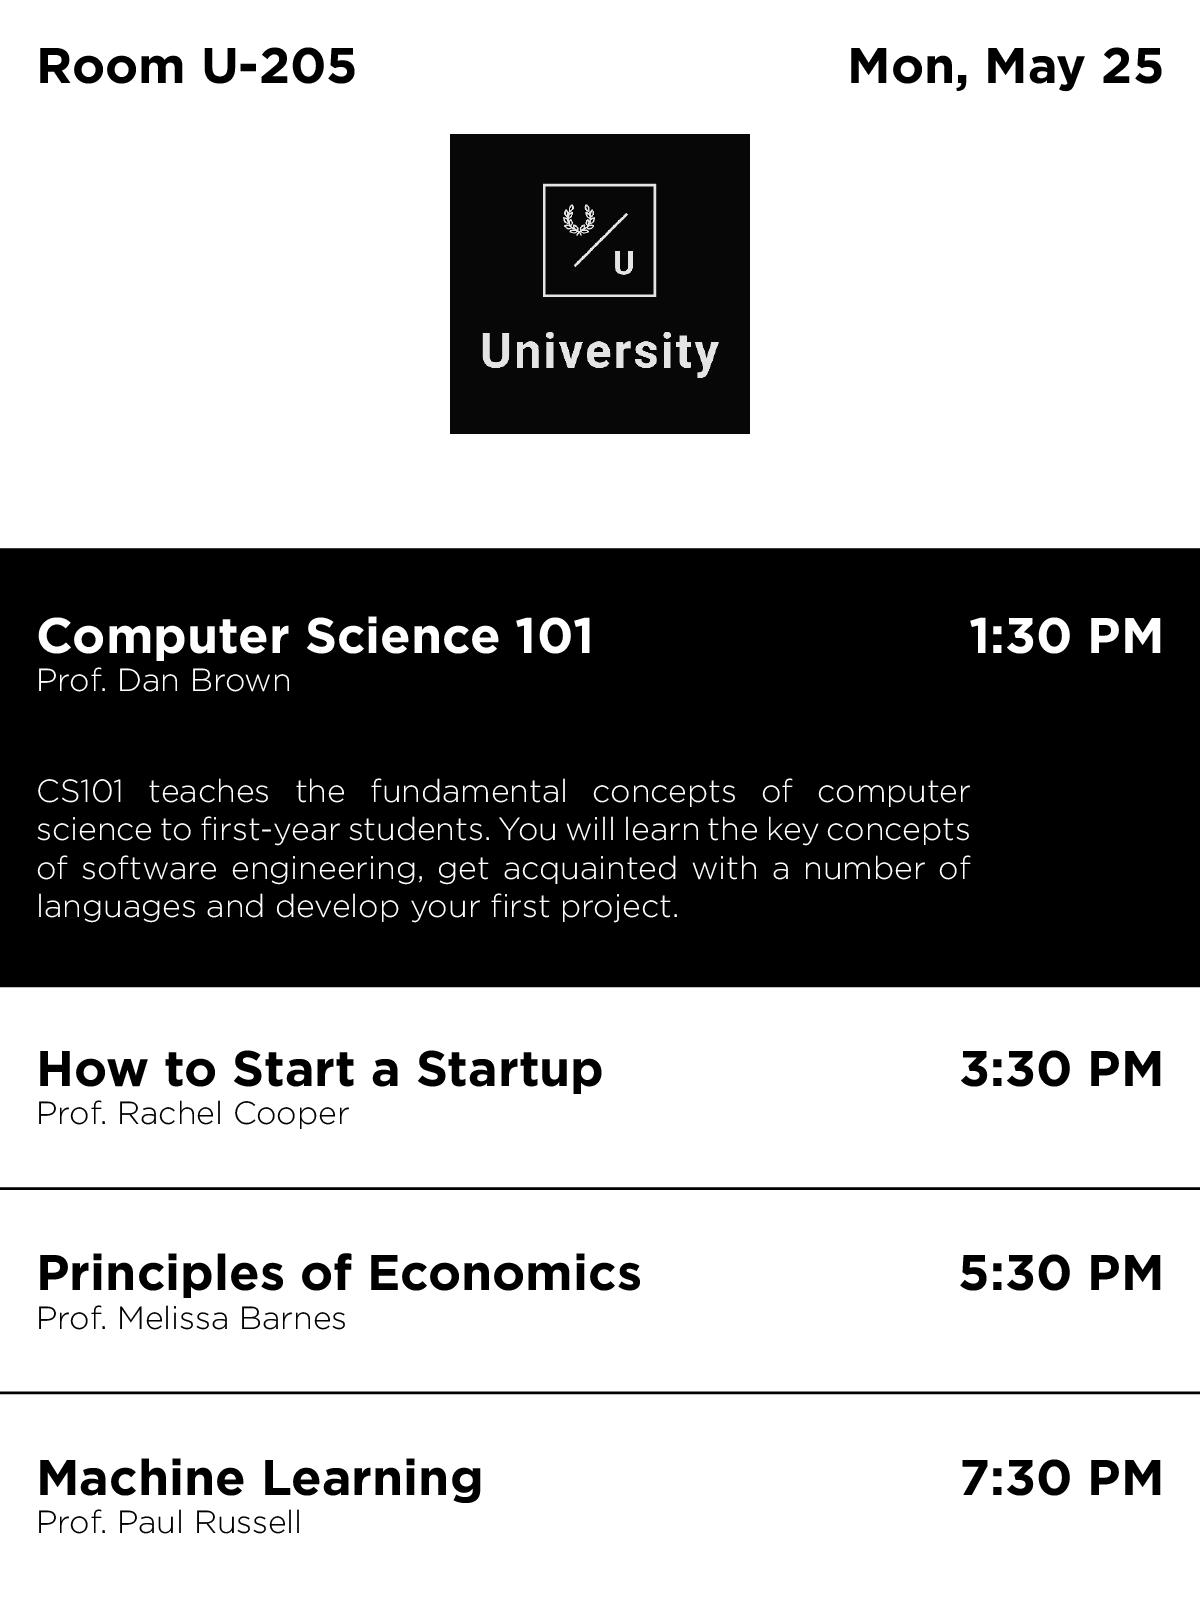 ePaper University Scheduling Digital Signage